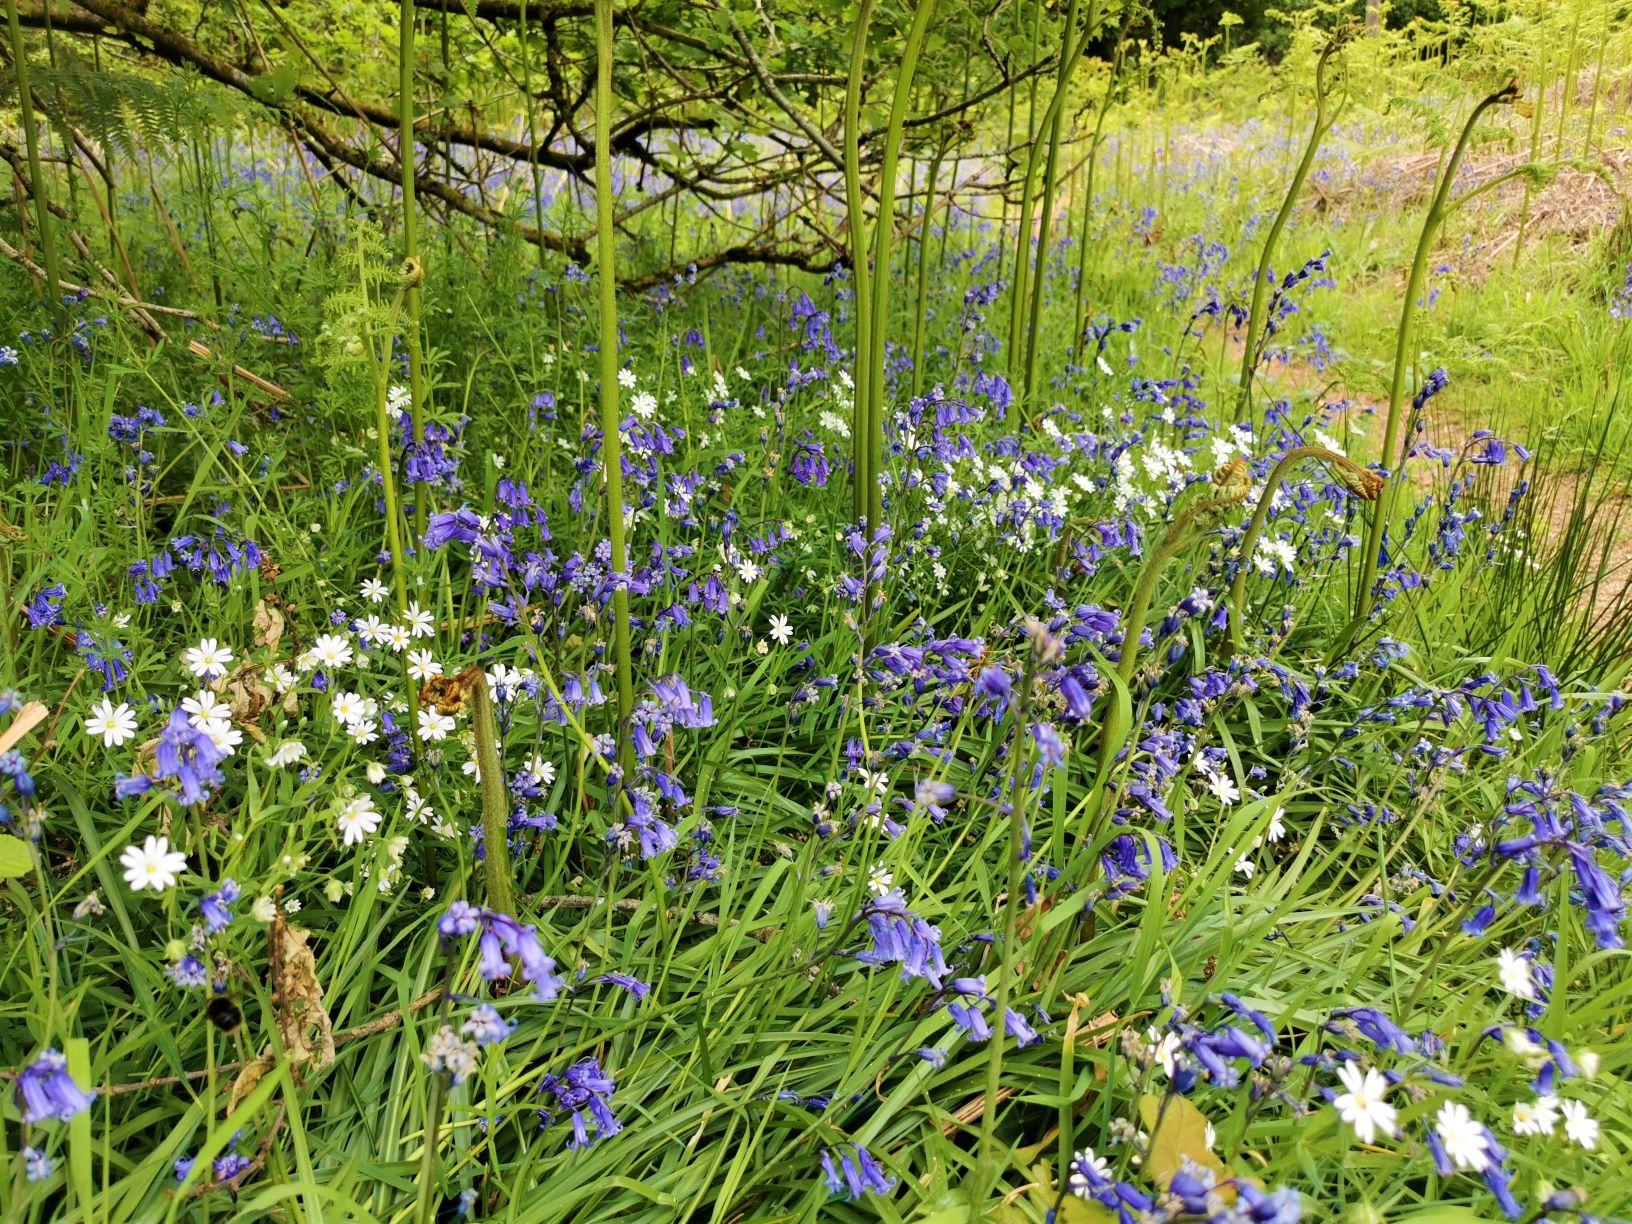 Tackley Wood